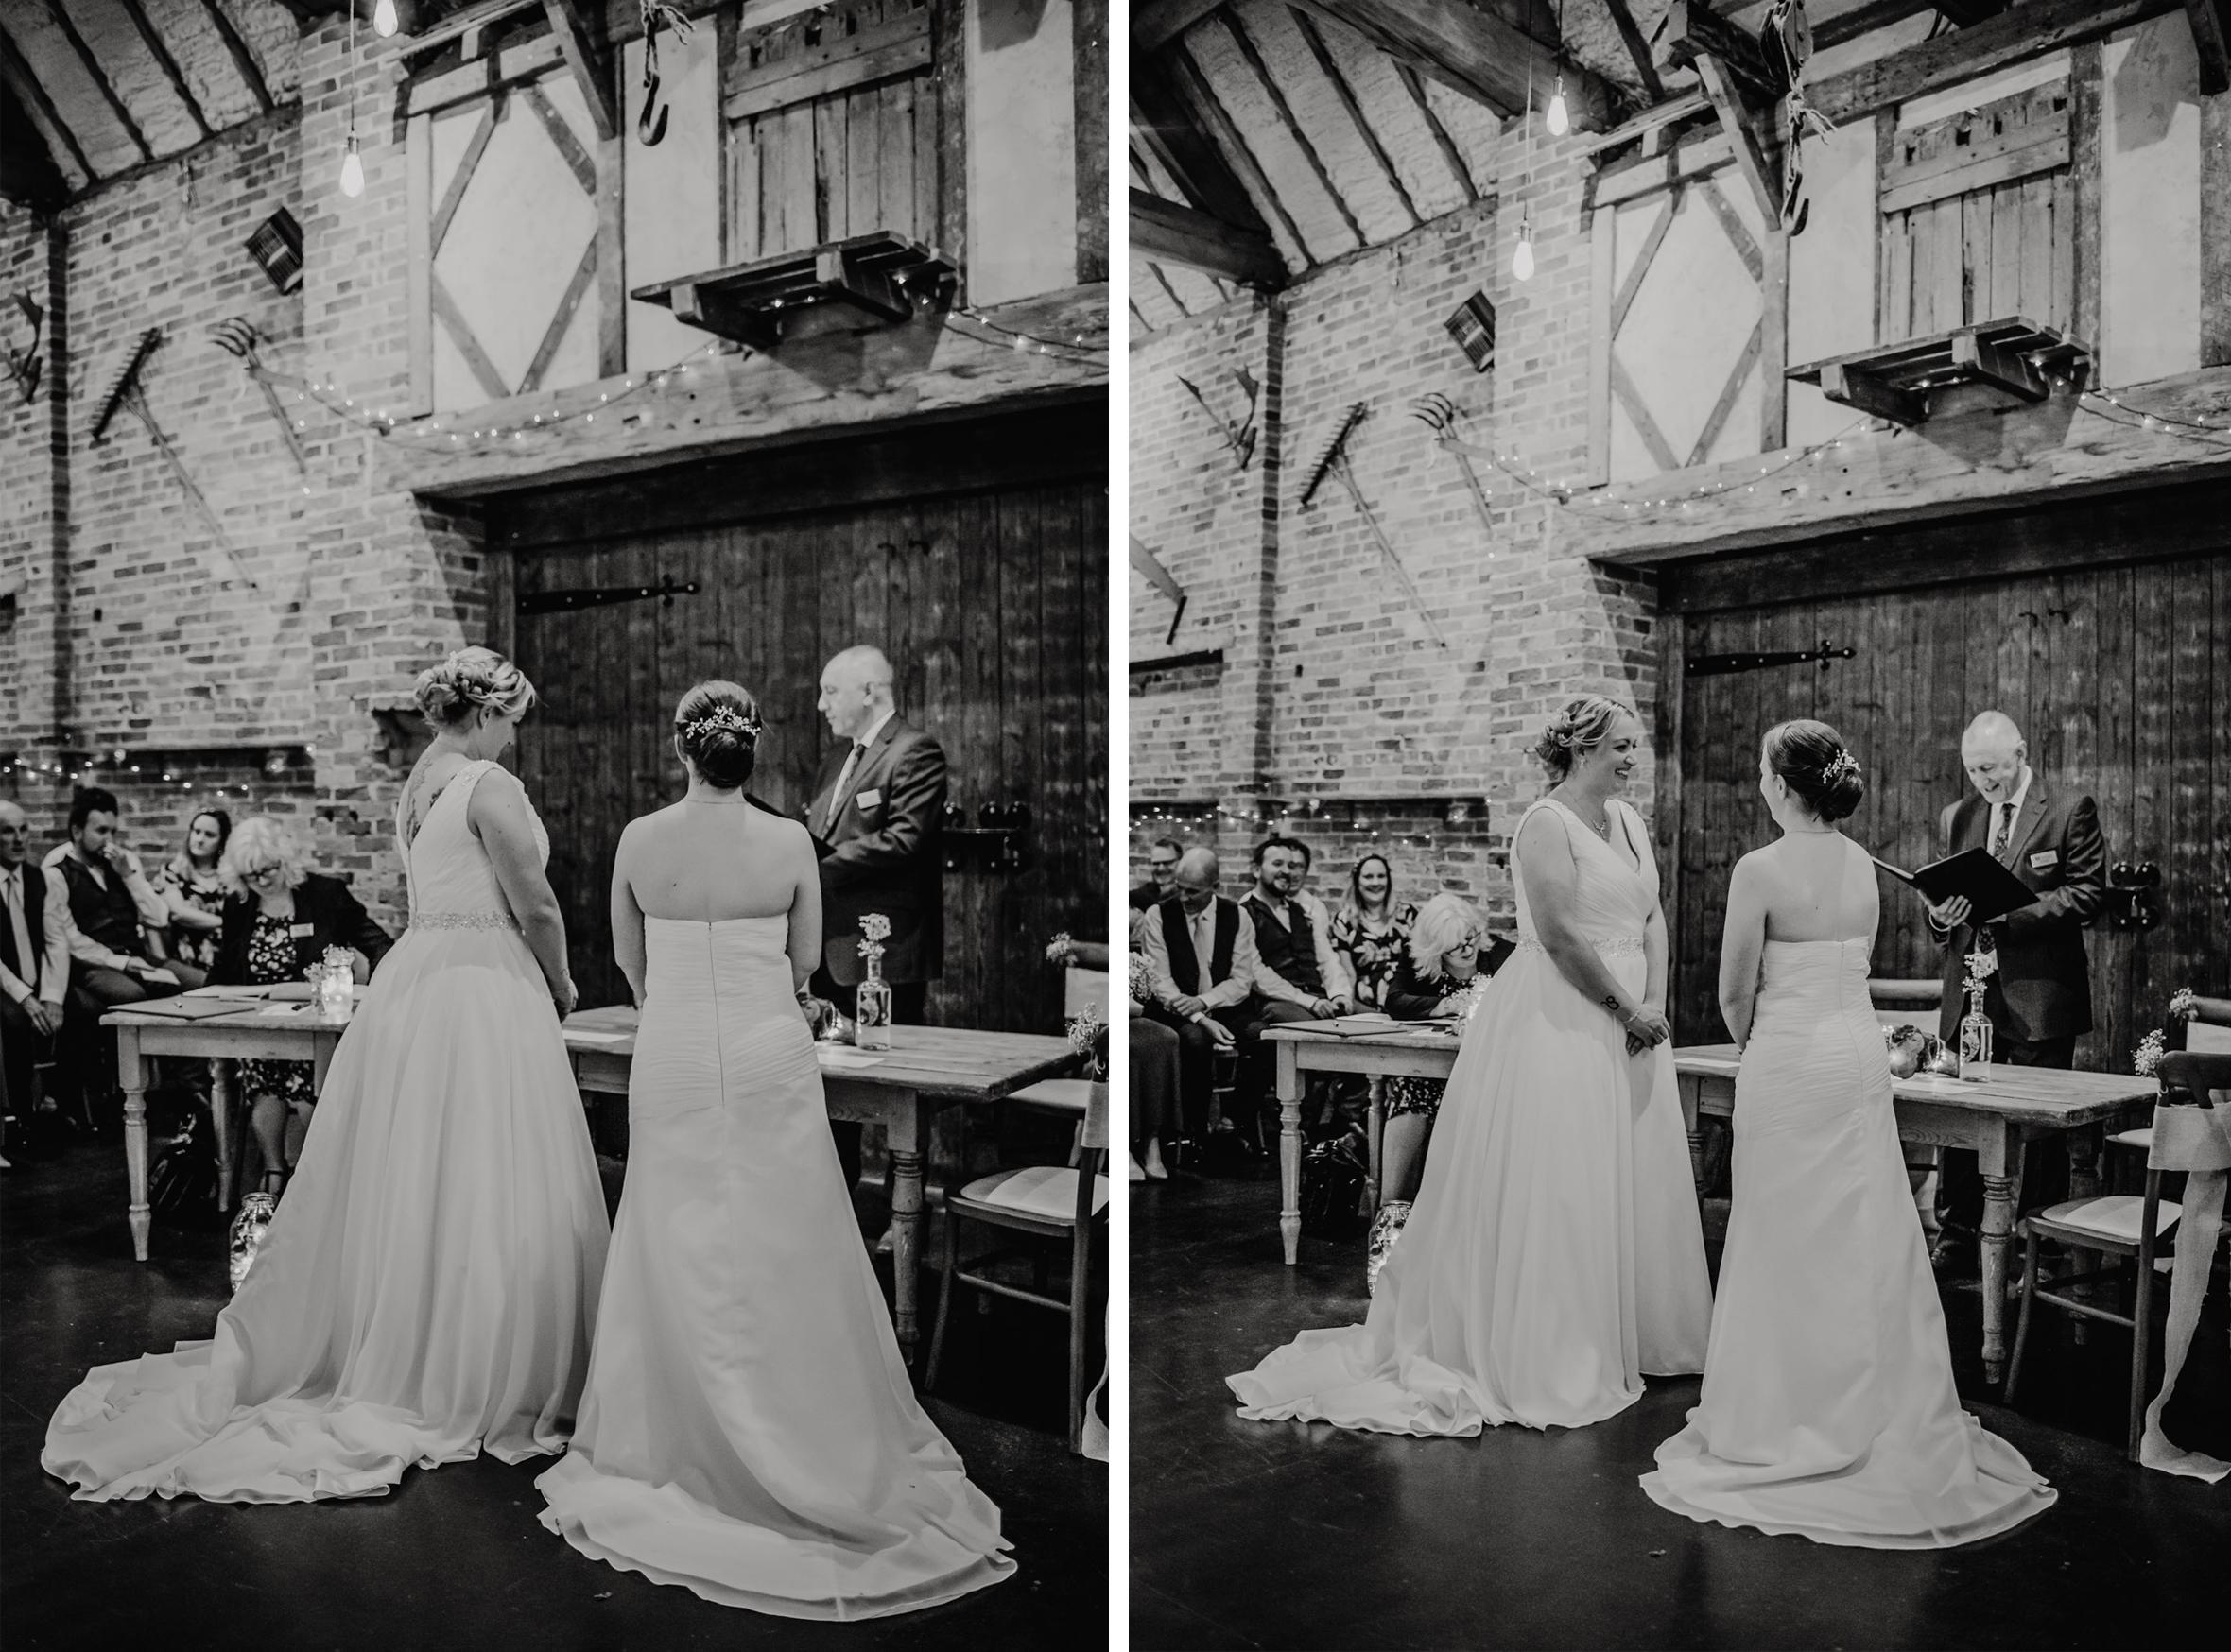 Donington-park-farm-wedding-photography002.jpg